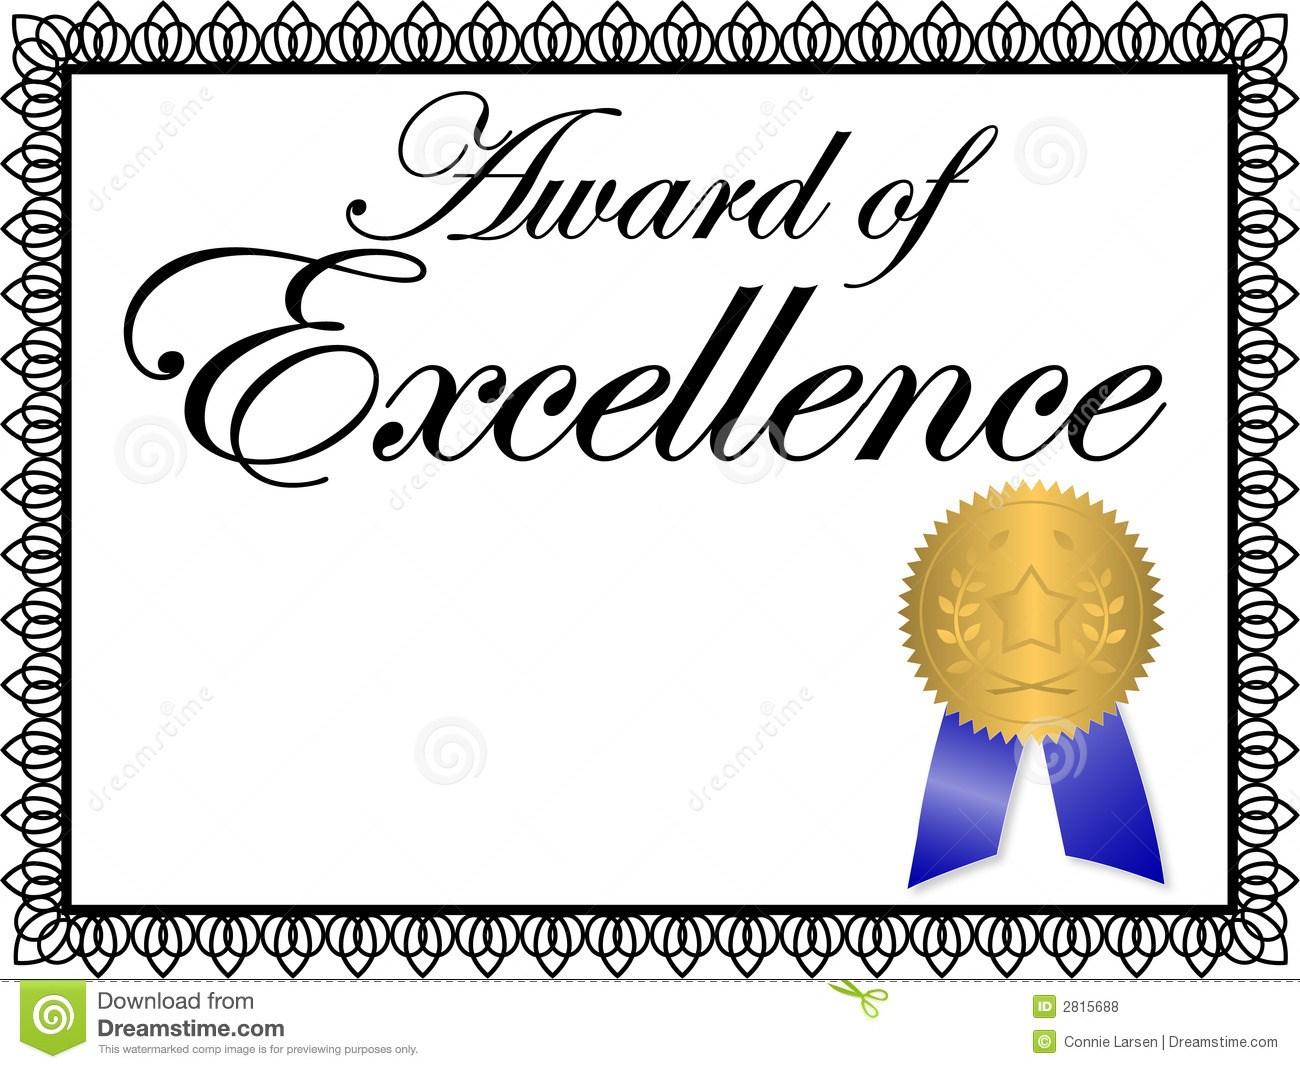 Award certificate clipart 5 » Clipart Portal.